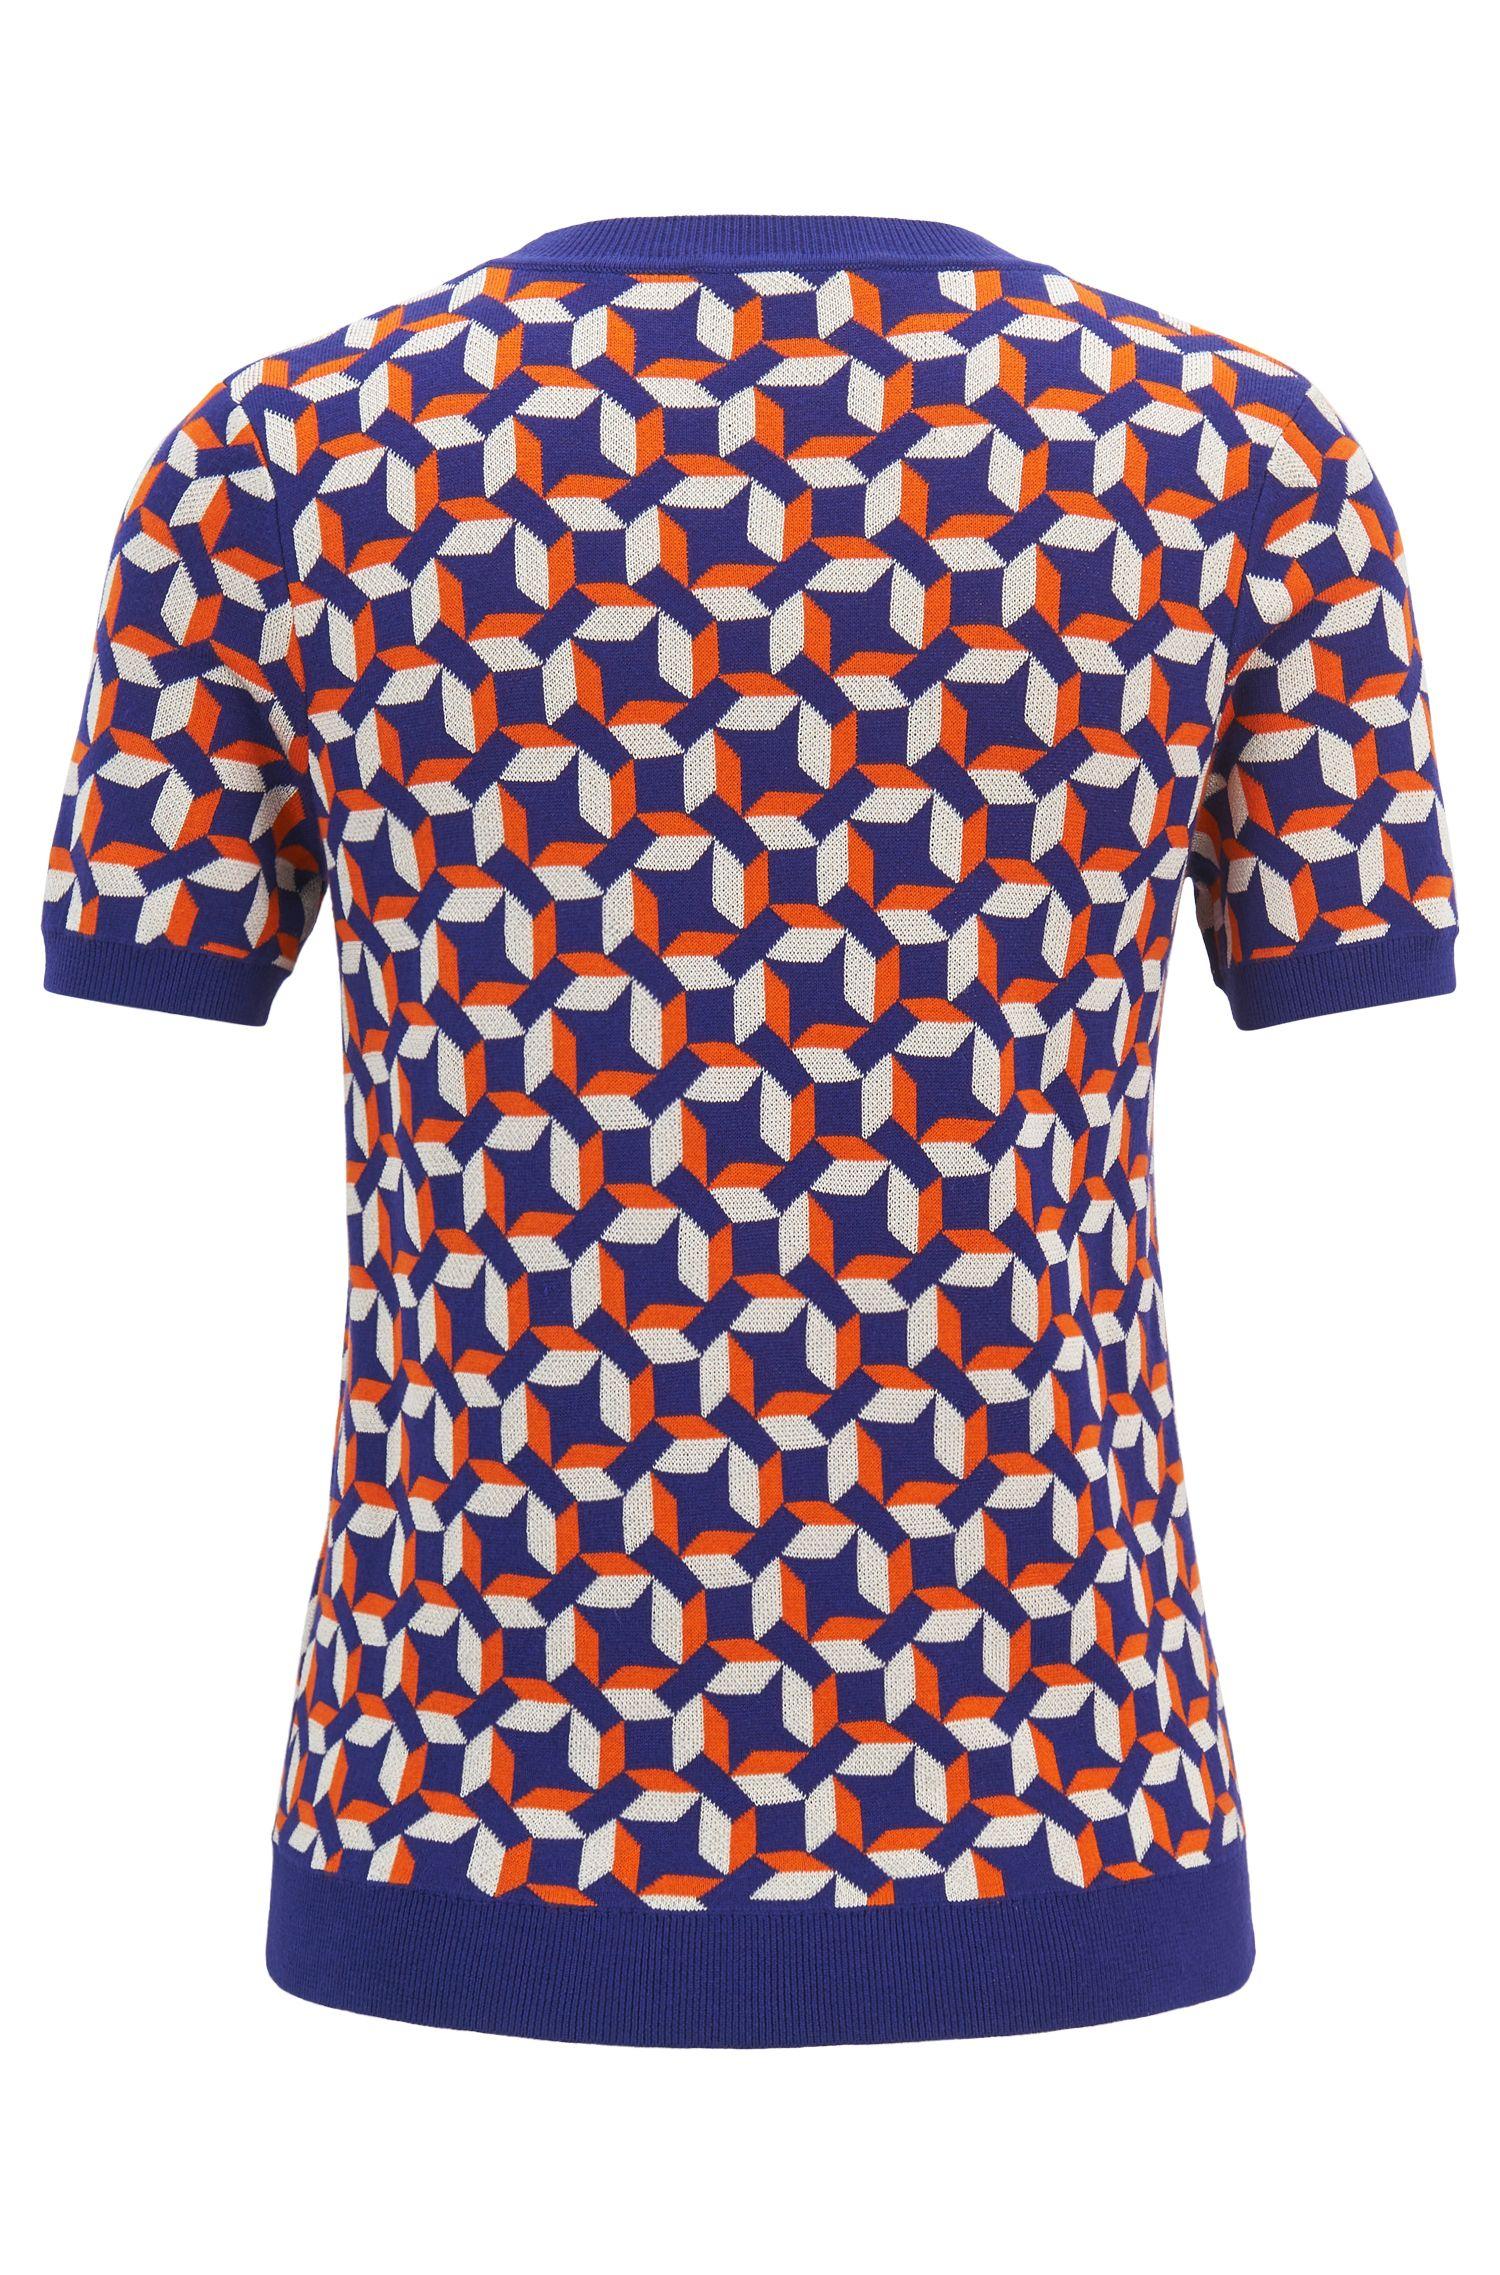 Kurzarm-Pullover mit mehrfarbigem Muster, Gemustert